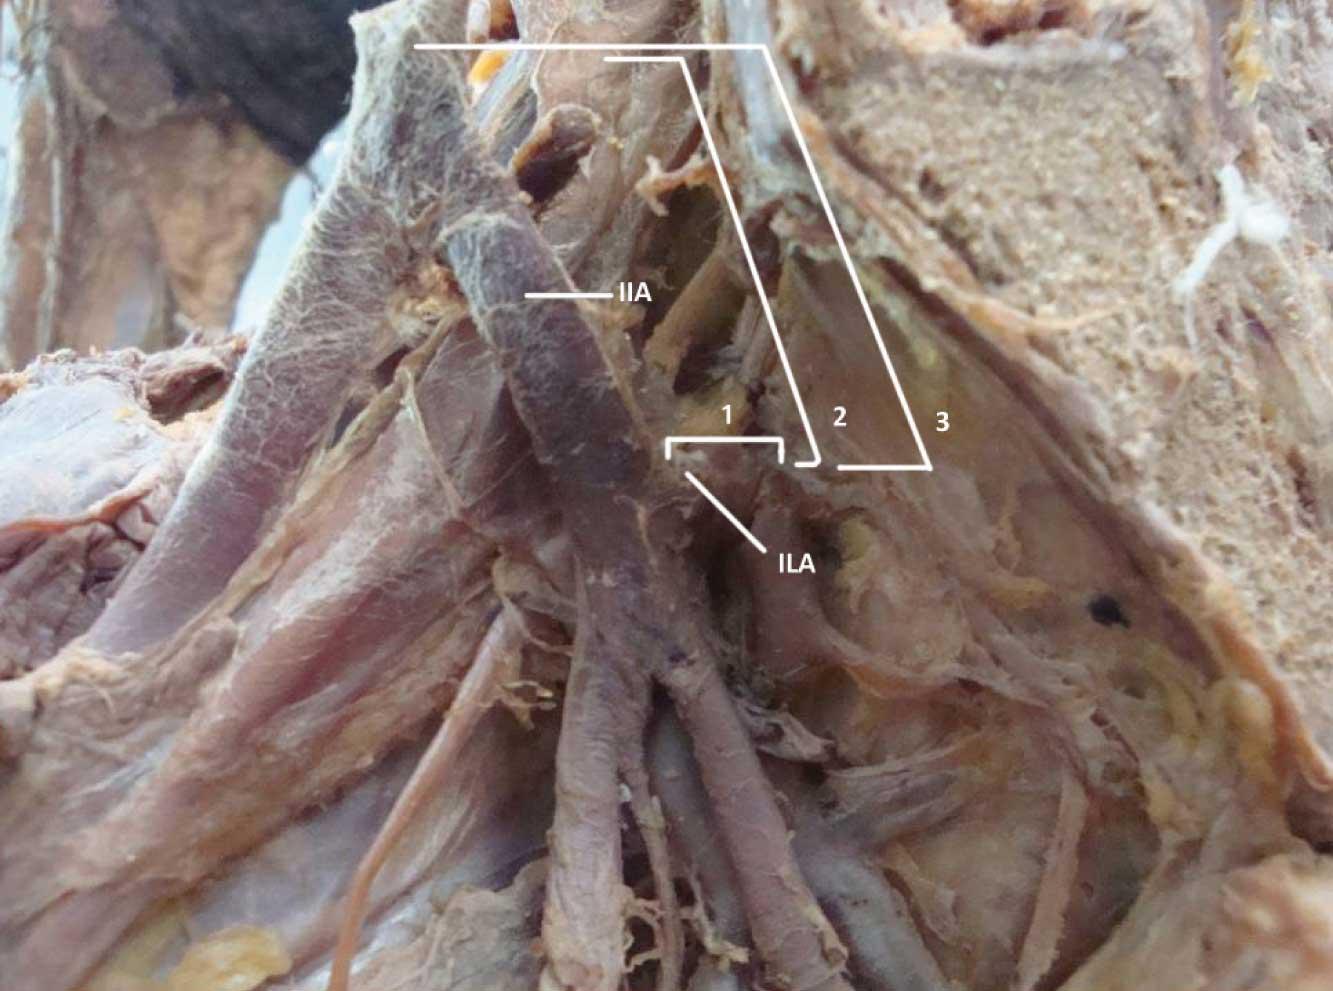 Obturator Nerve Cadaver Different parameters measuredLumbosacral Plexus Cadaver